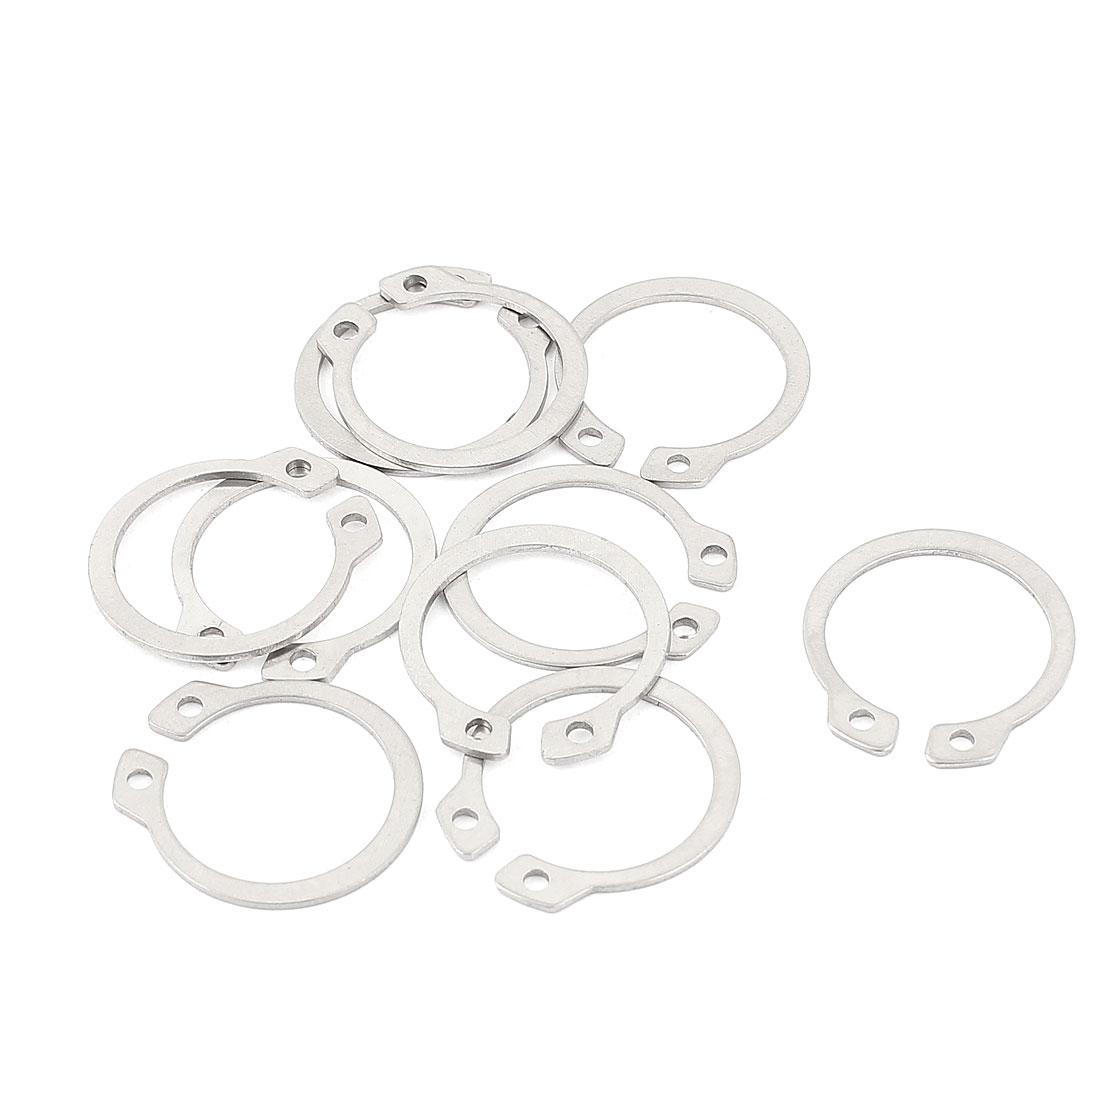 10pcs 304 Stainless Steel External Circlip Retaining Shaft Snap Rings 21mm